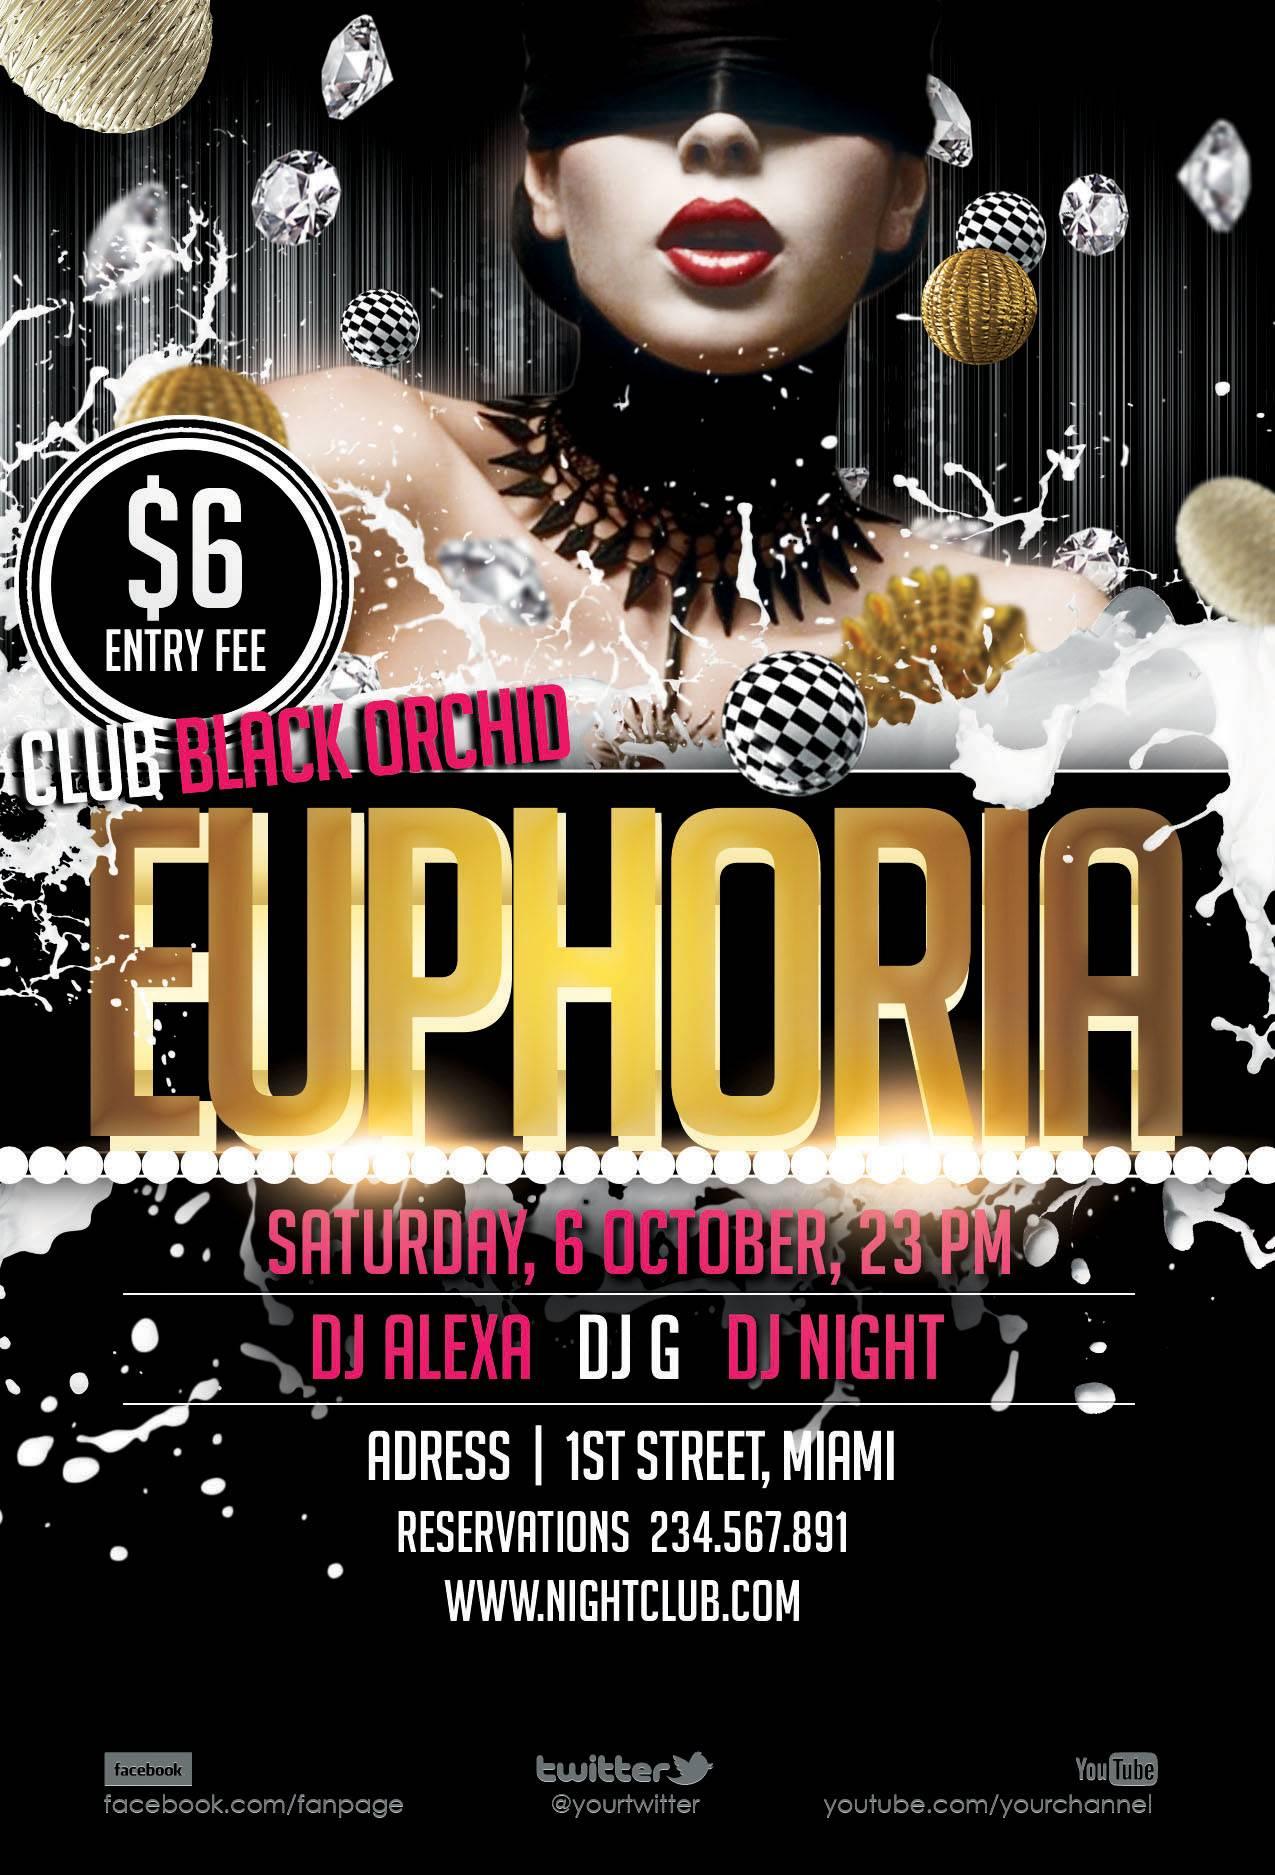 Nightclub Flyer Psd Template